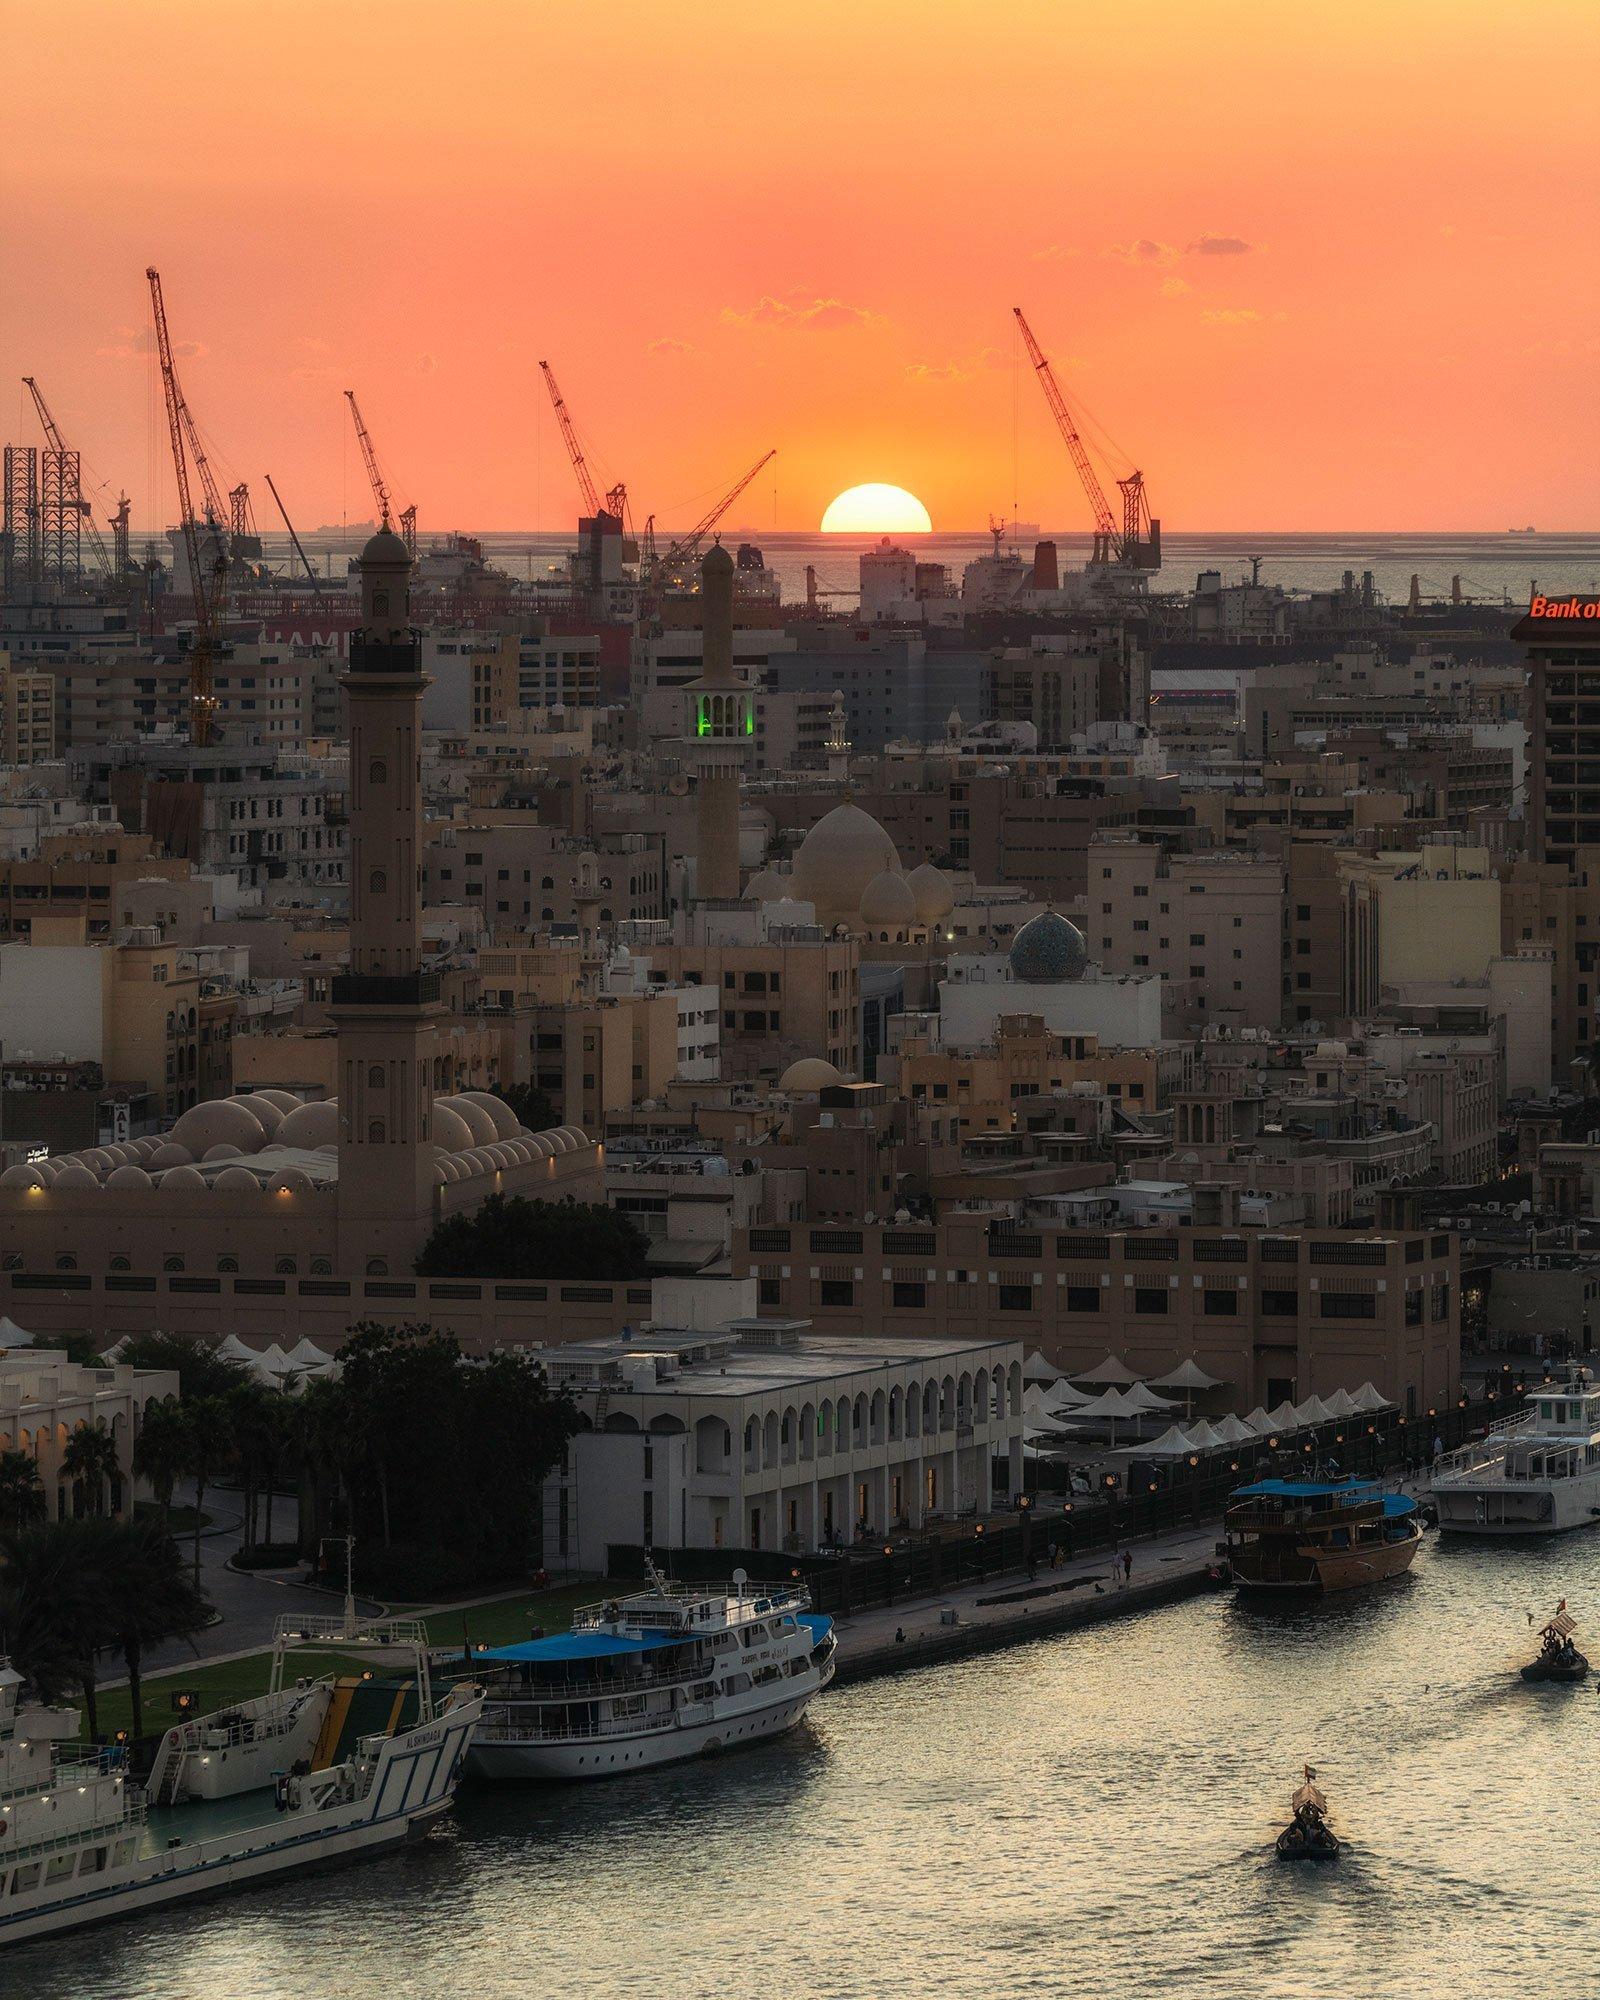 sunset over the Dubai creek